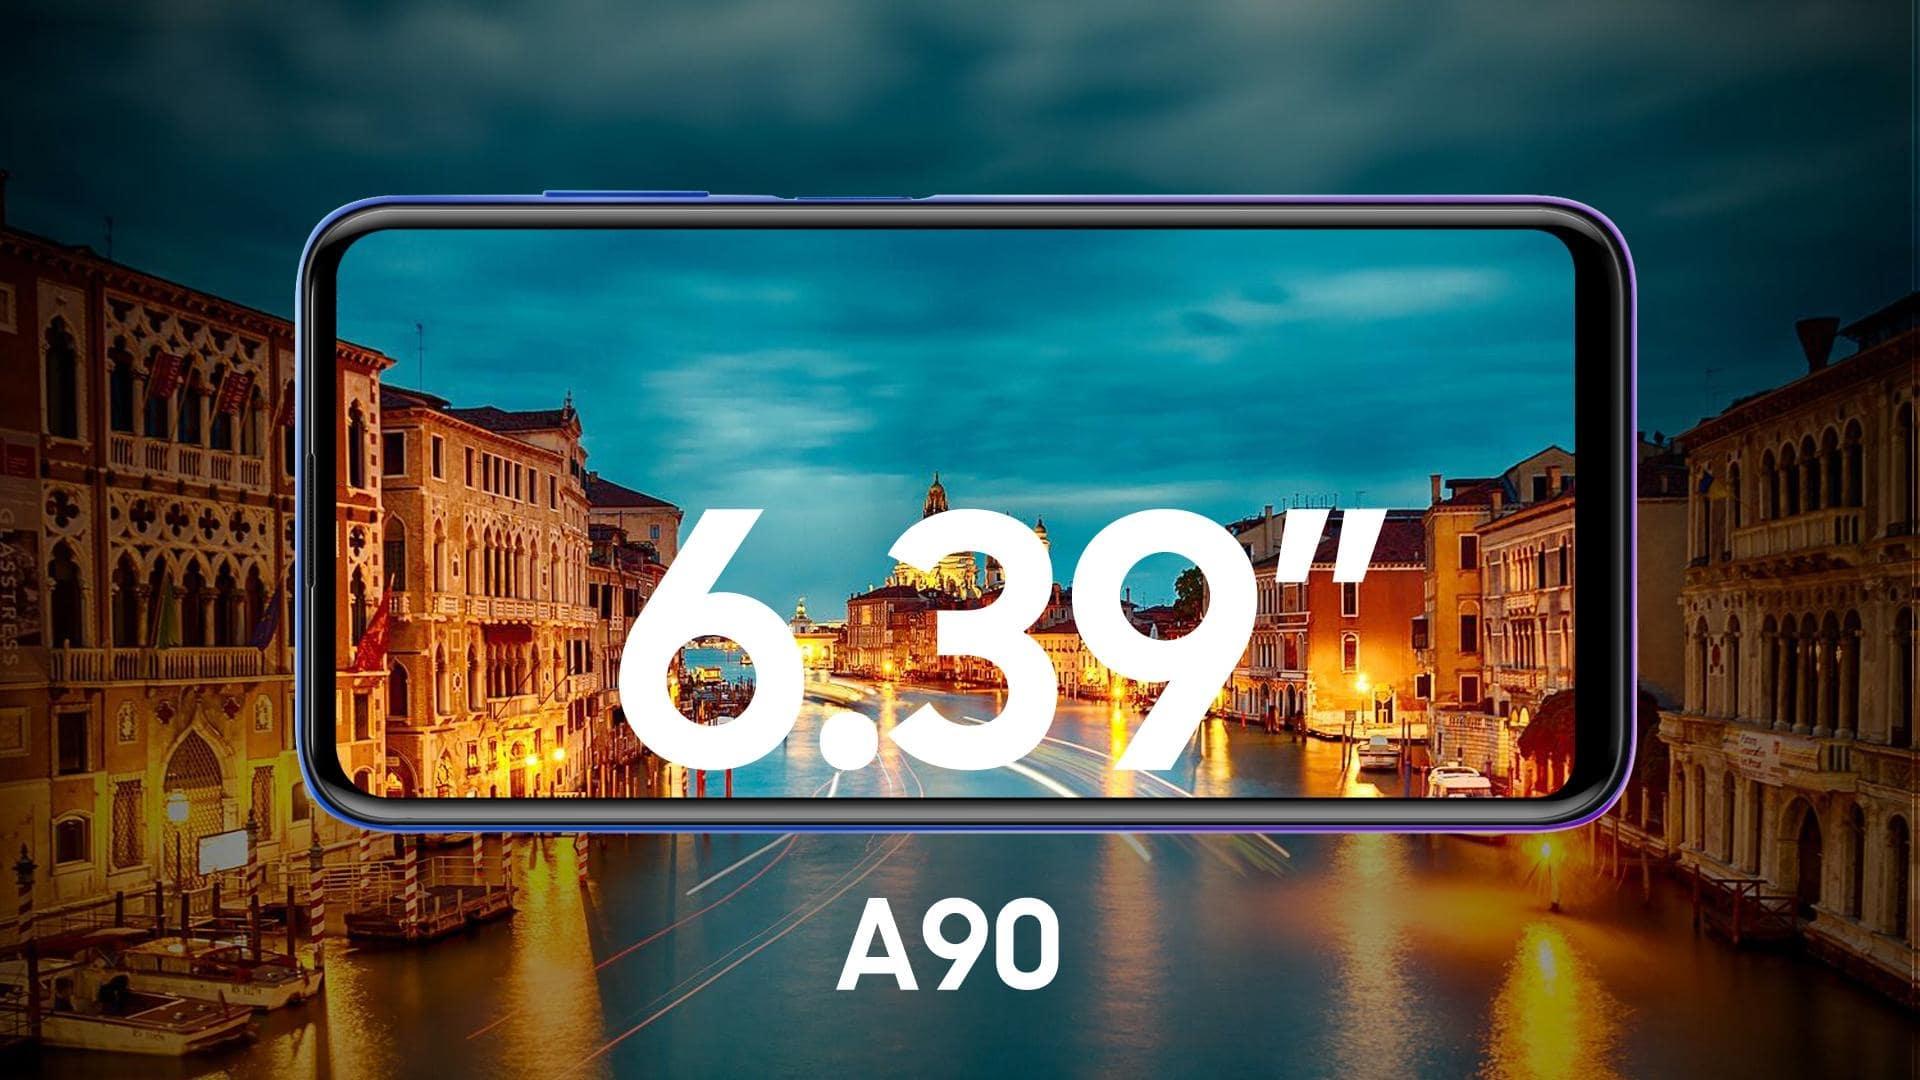 Blackview A90 Smartphone